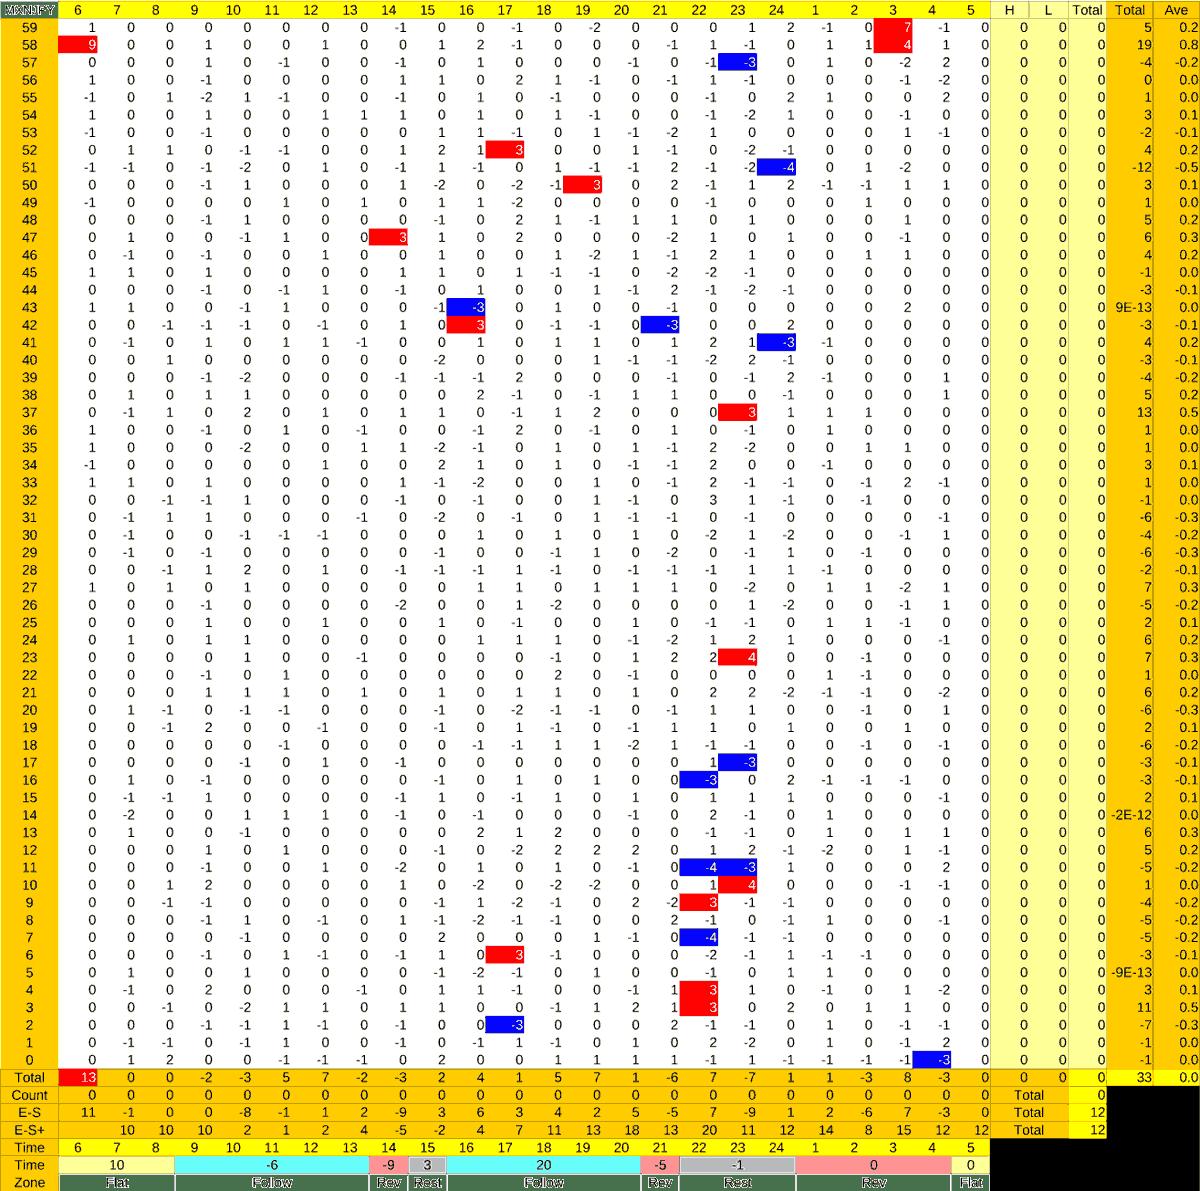 20210409_HS(3)MXNJPY